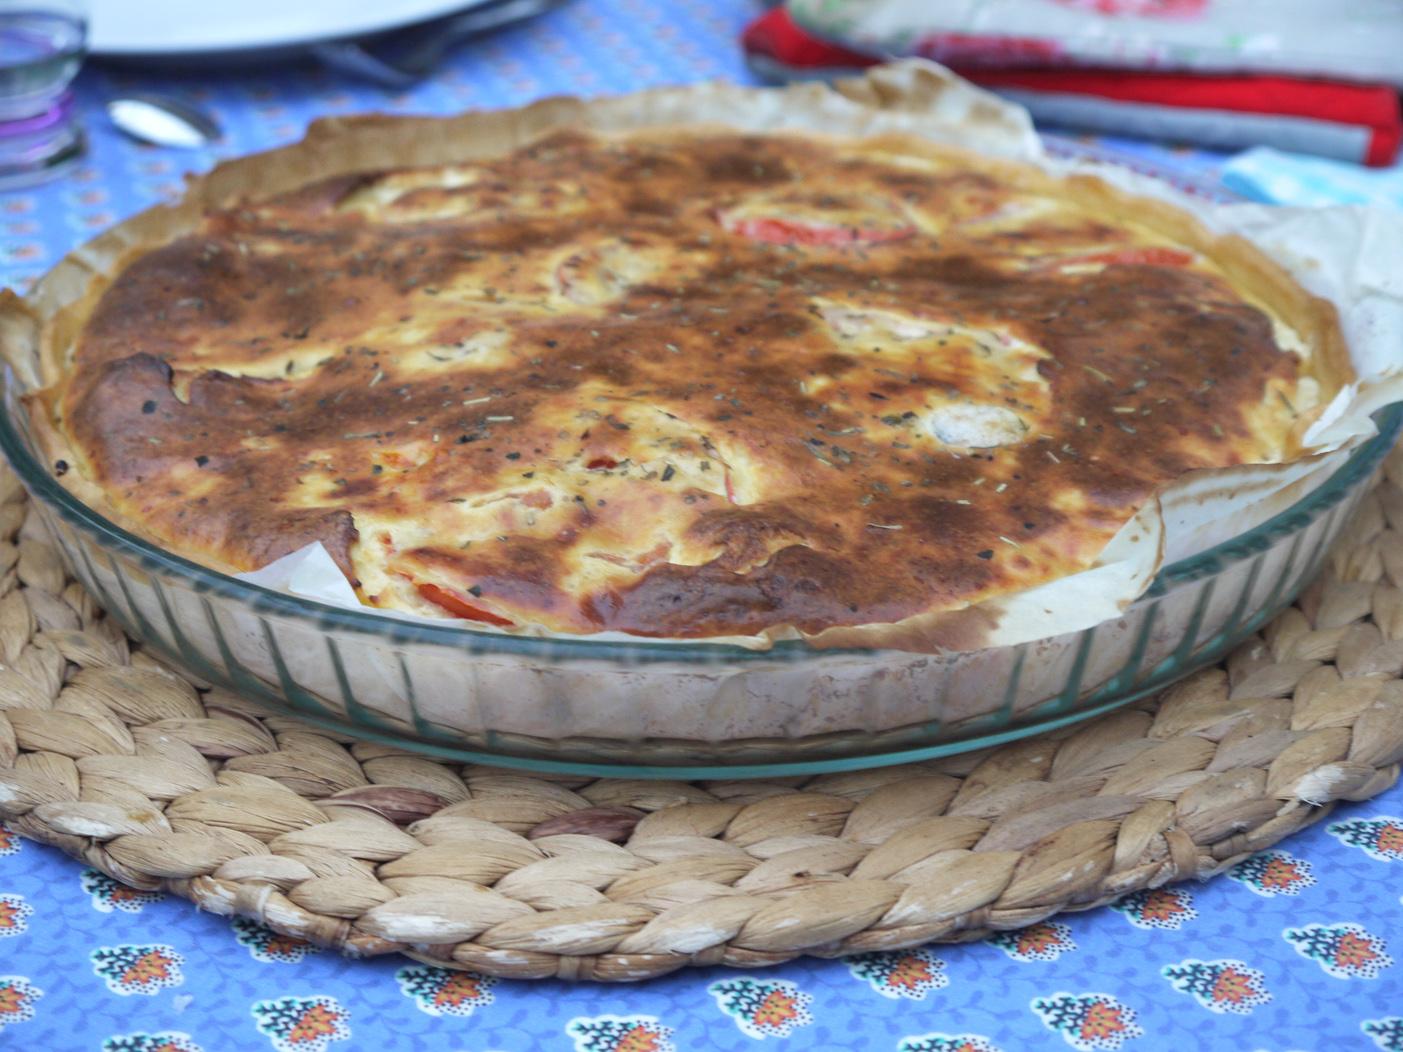 Tomato souffle tart